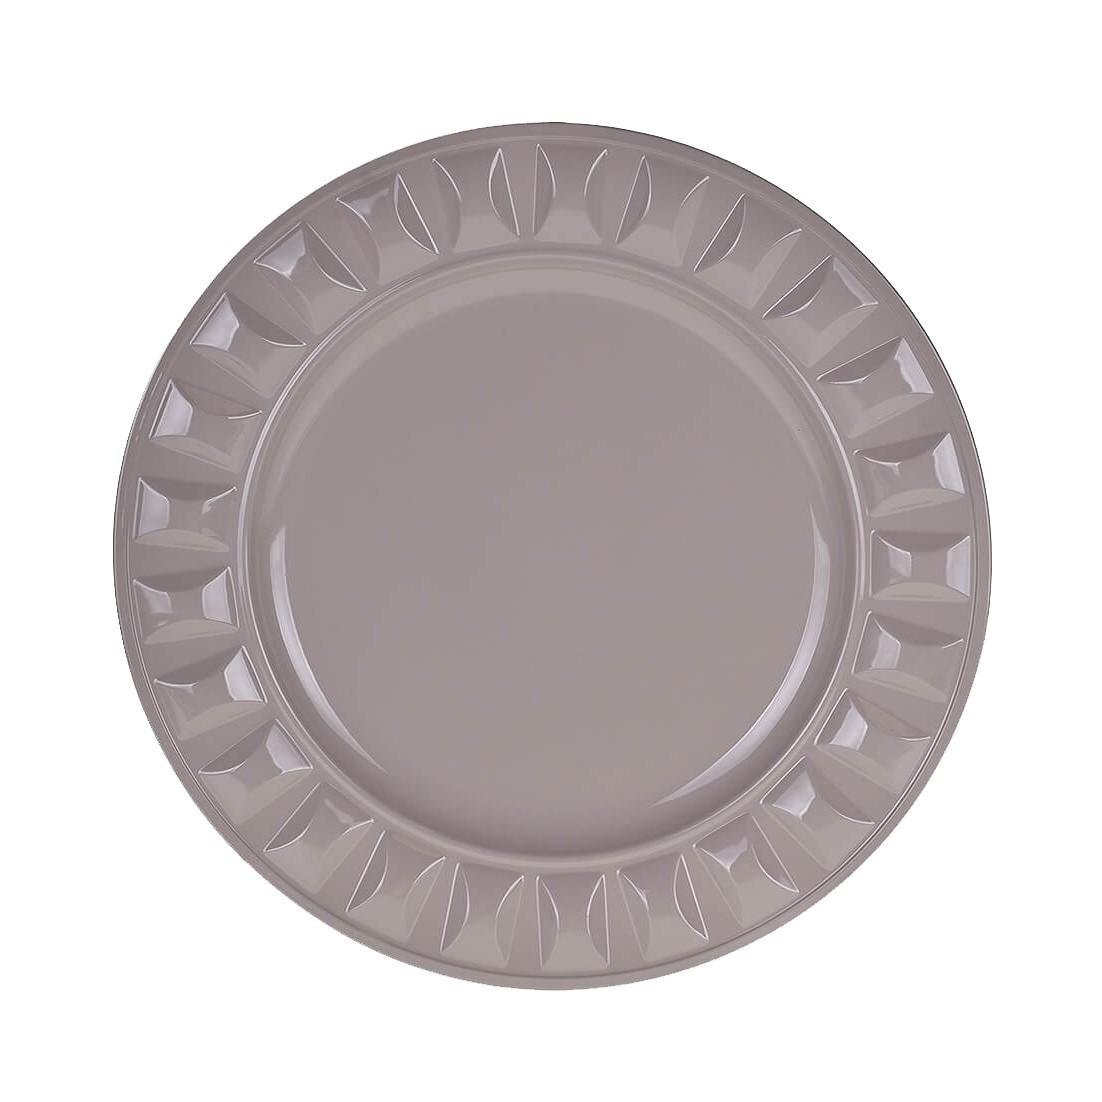 Sousplat Redondo Plastico 33cm Bege 44615-040 - G Presentes